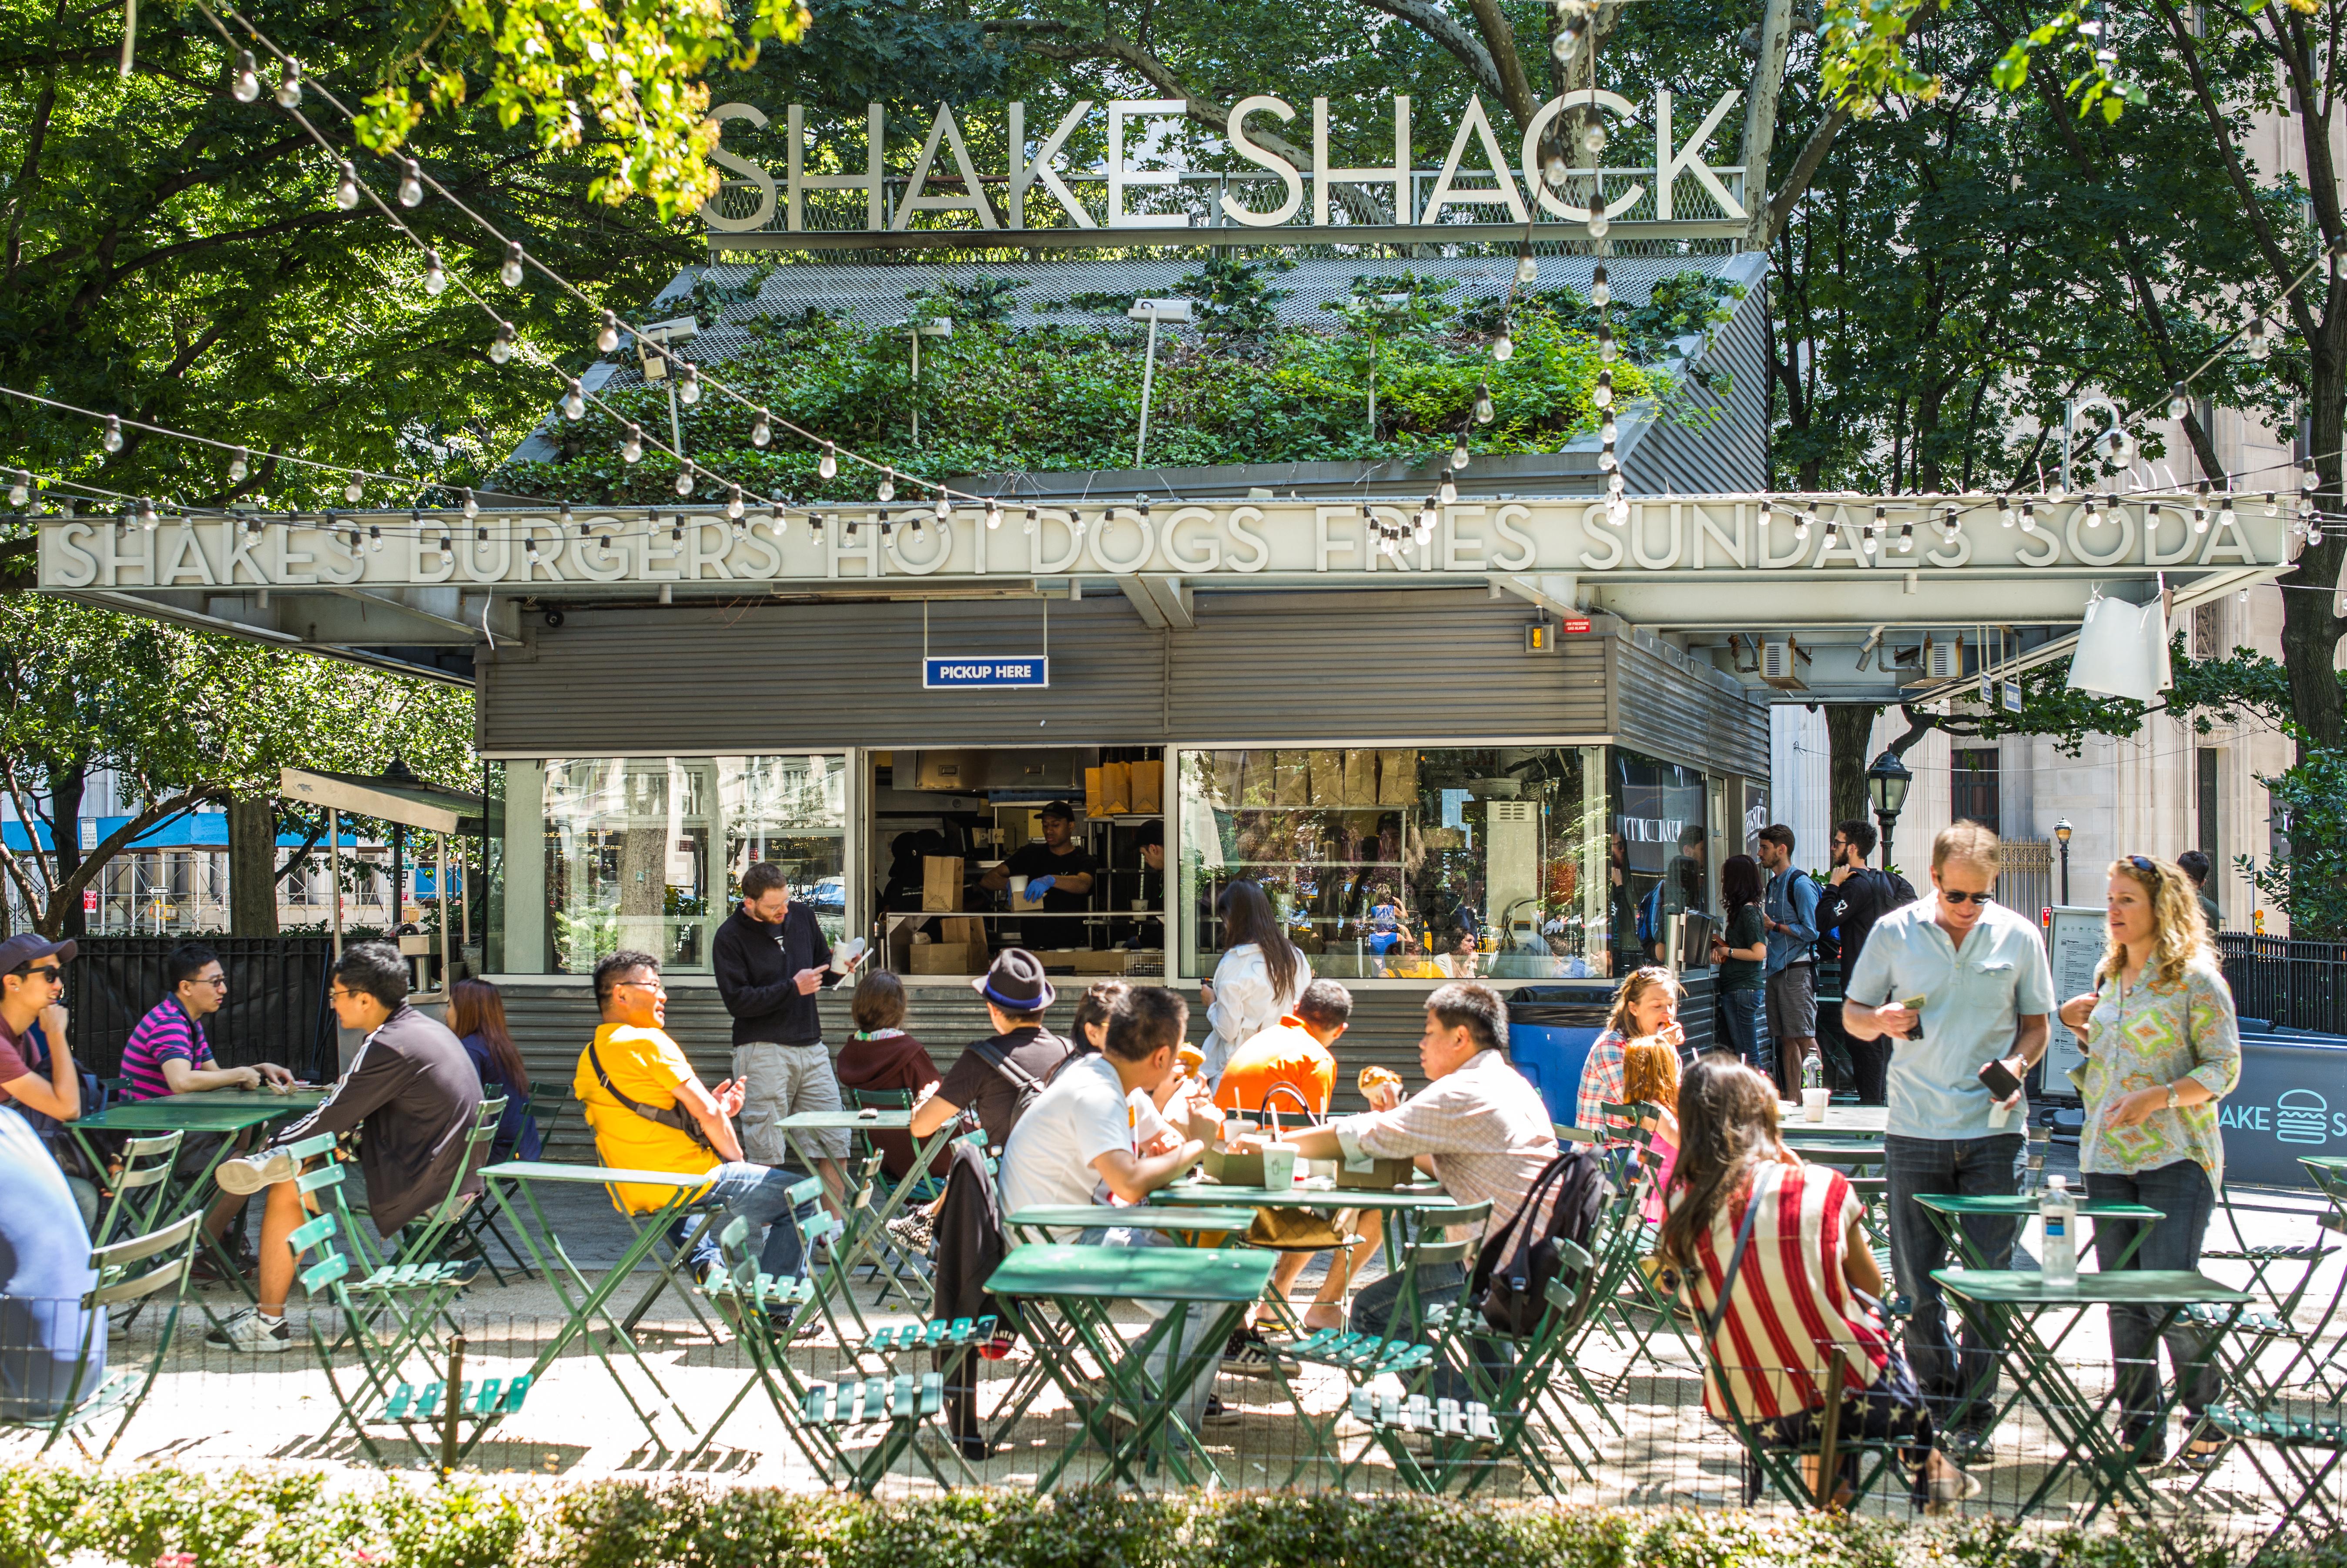 The original Shake Shack in Madison Square Park.